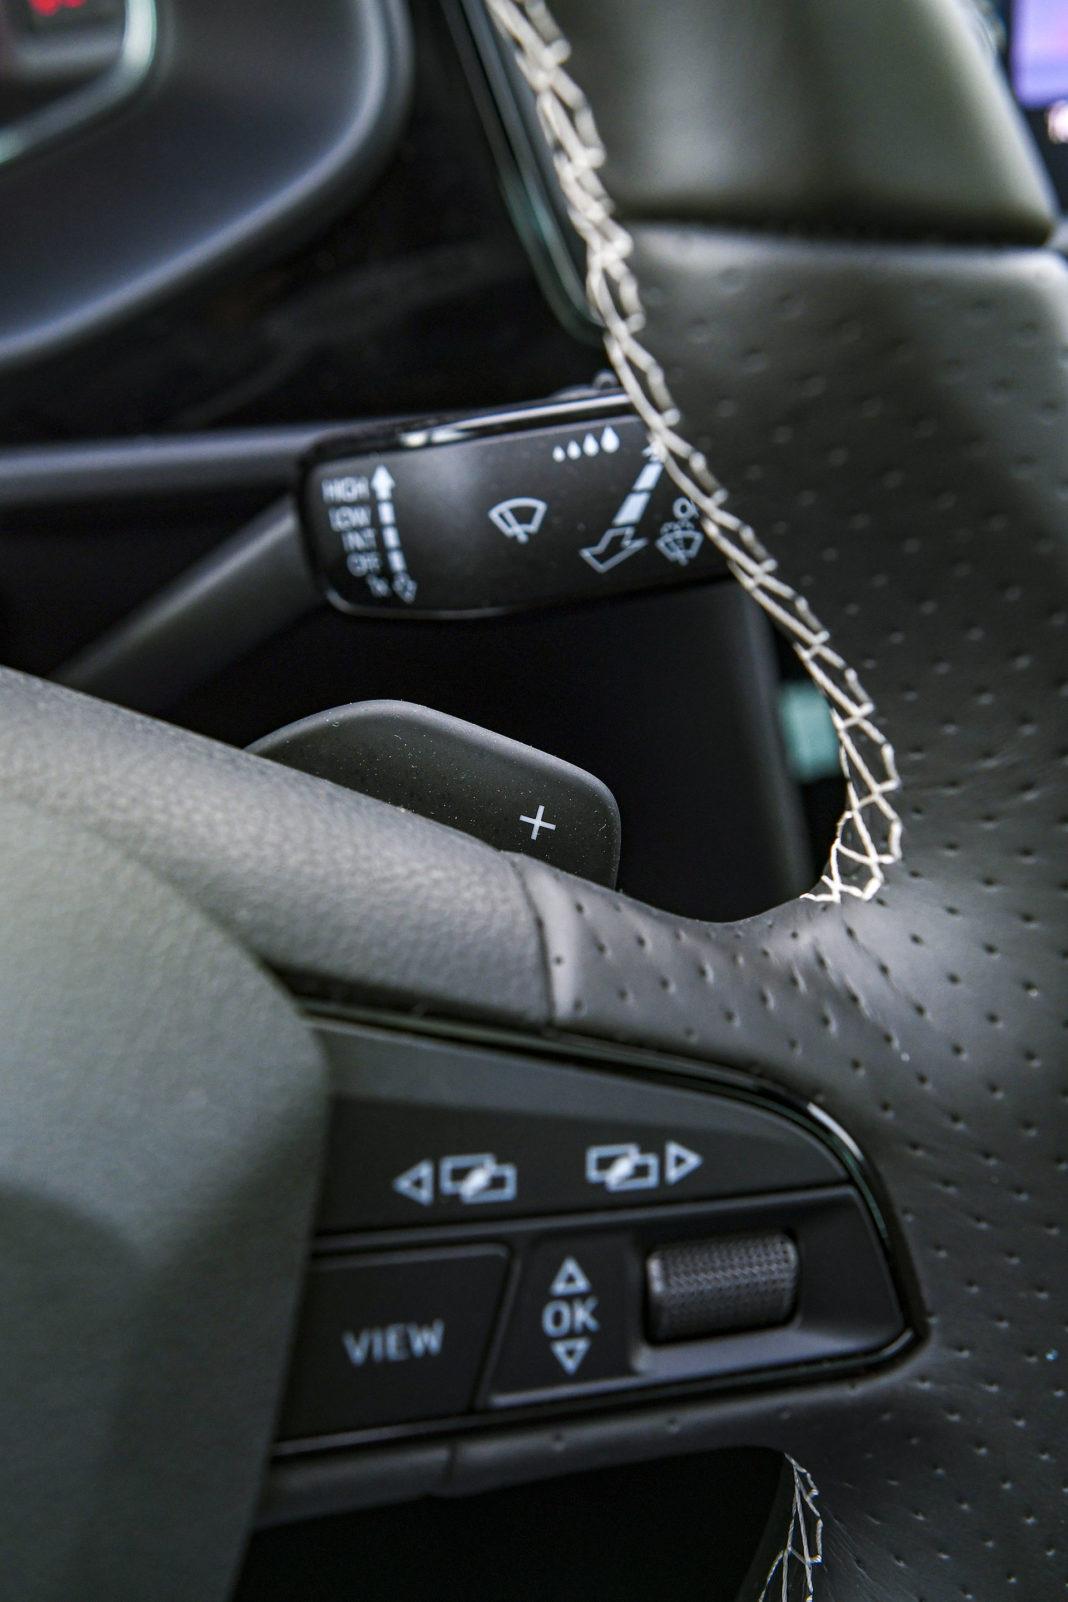 2019 Seat Leon Cupra - łopatki